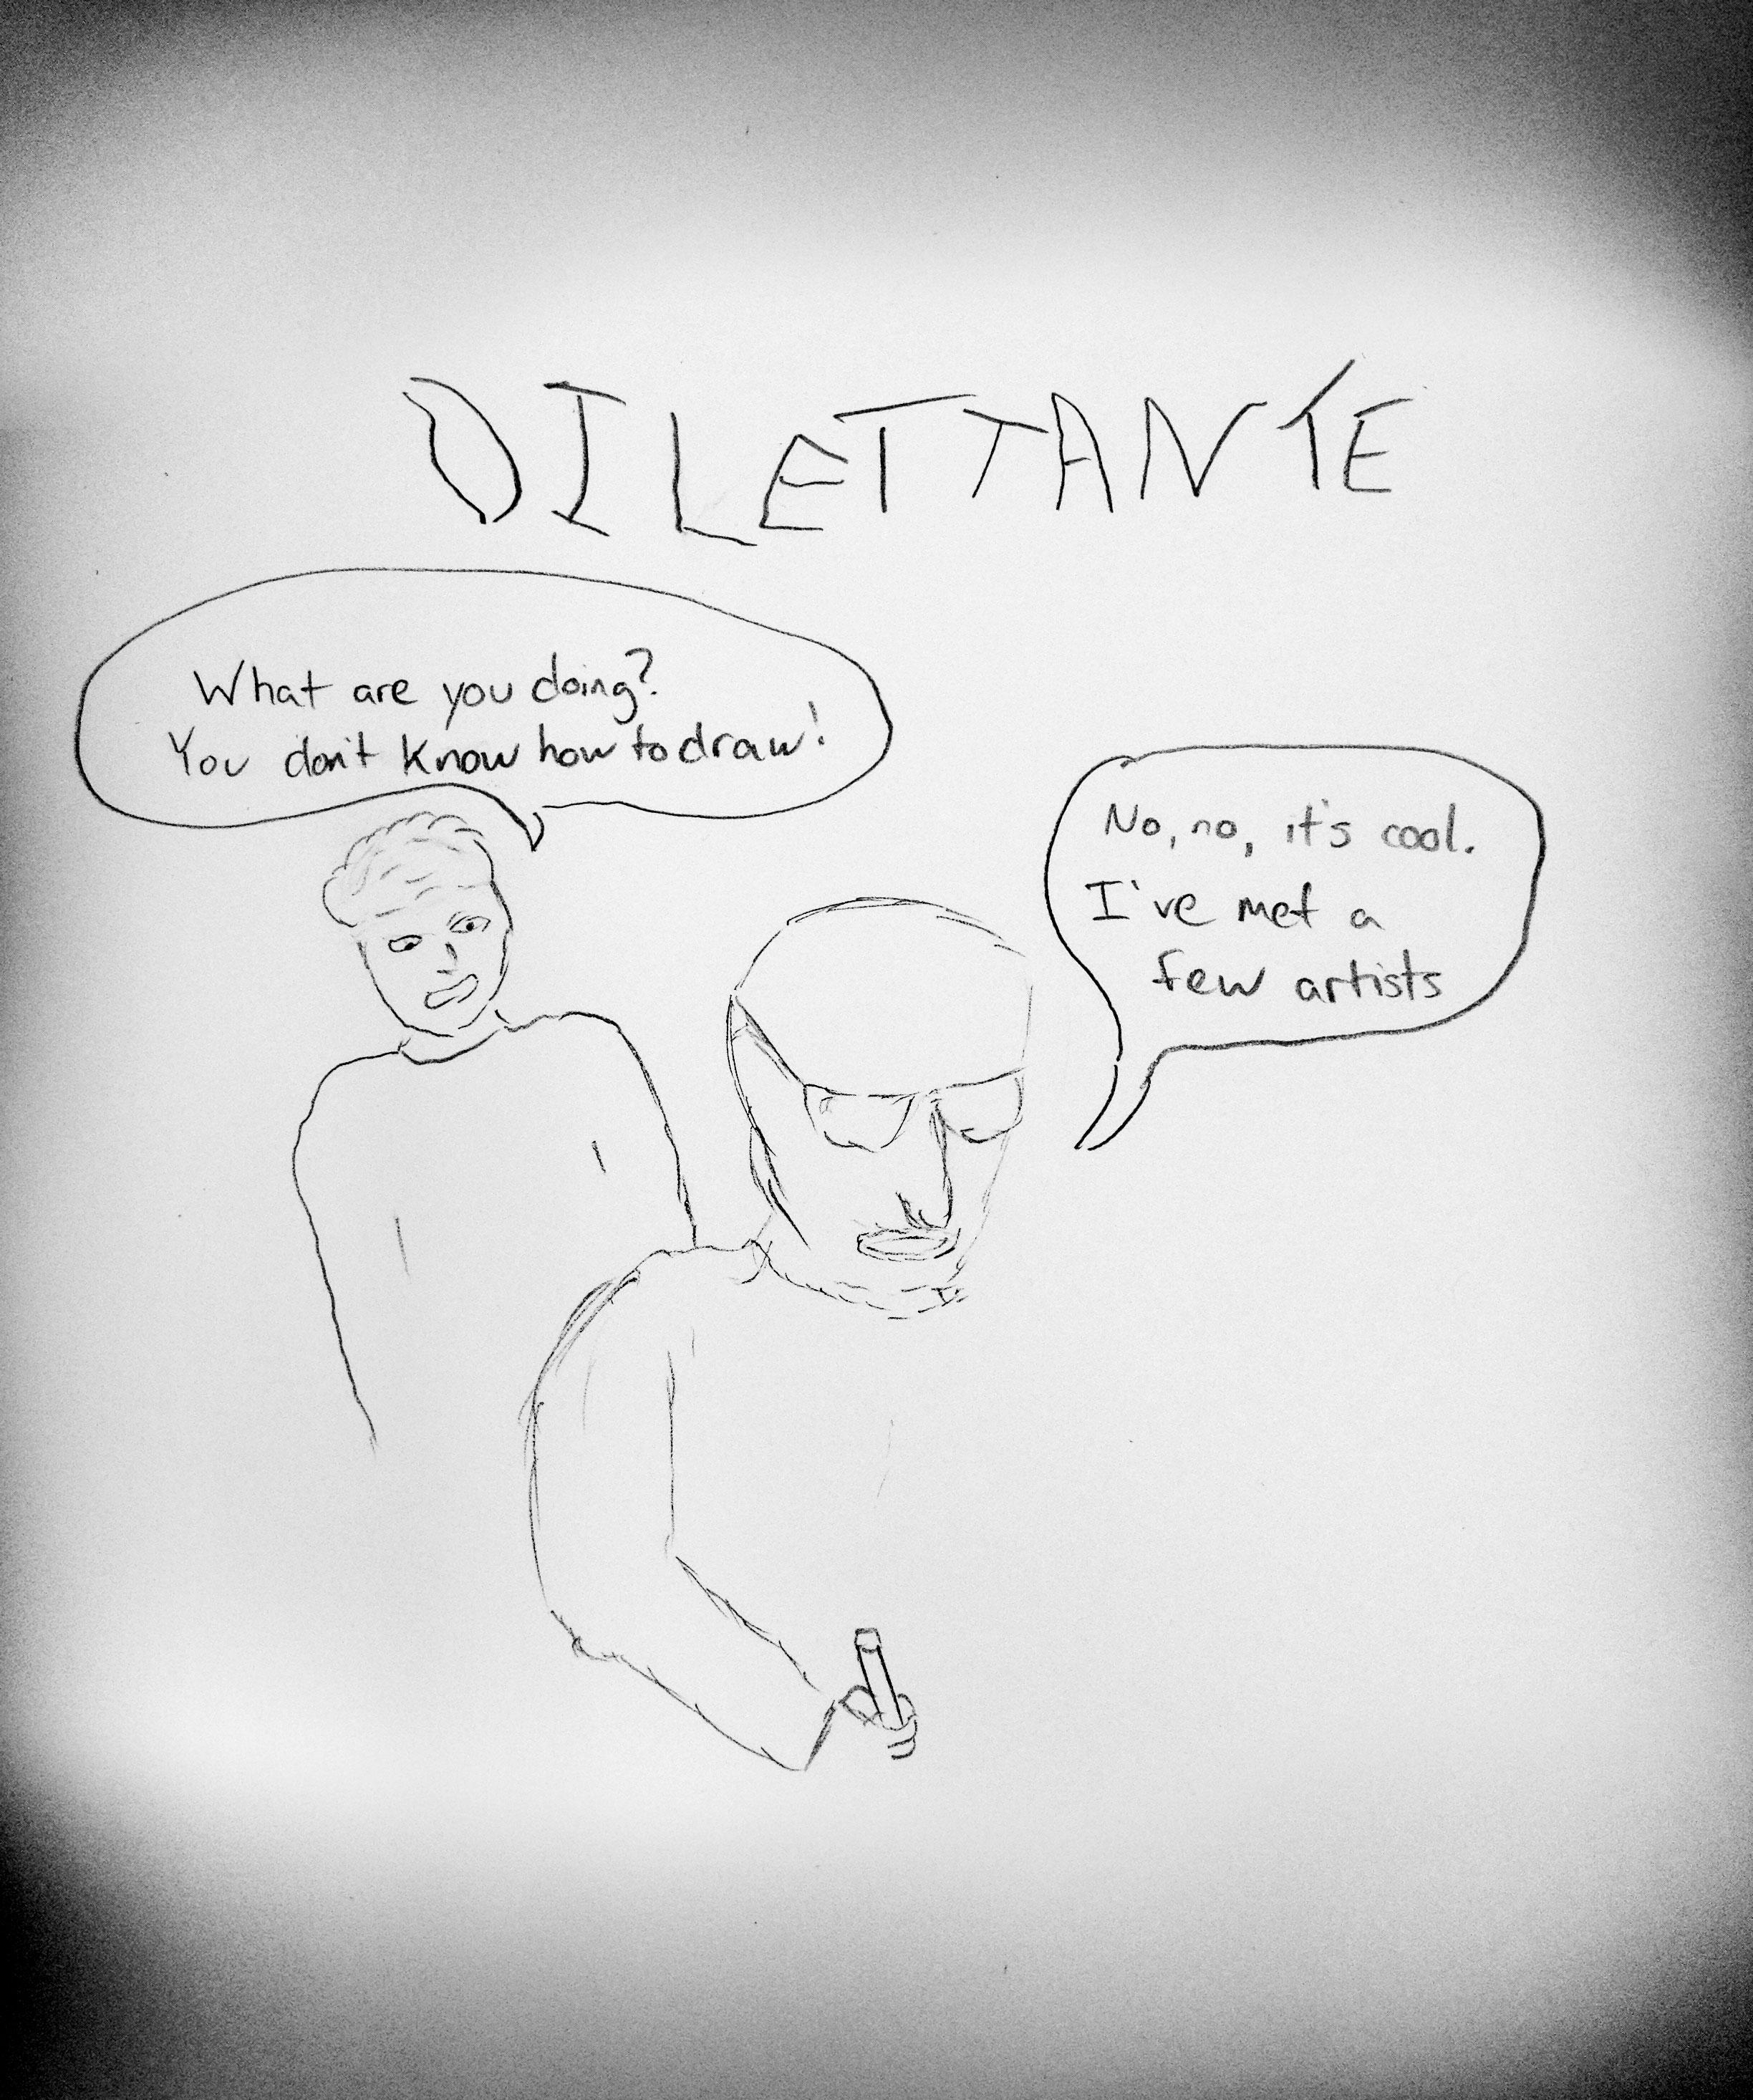 Visual Vocabulary: dilettante illustration by Scott Davis